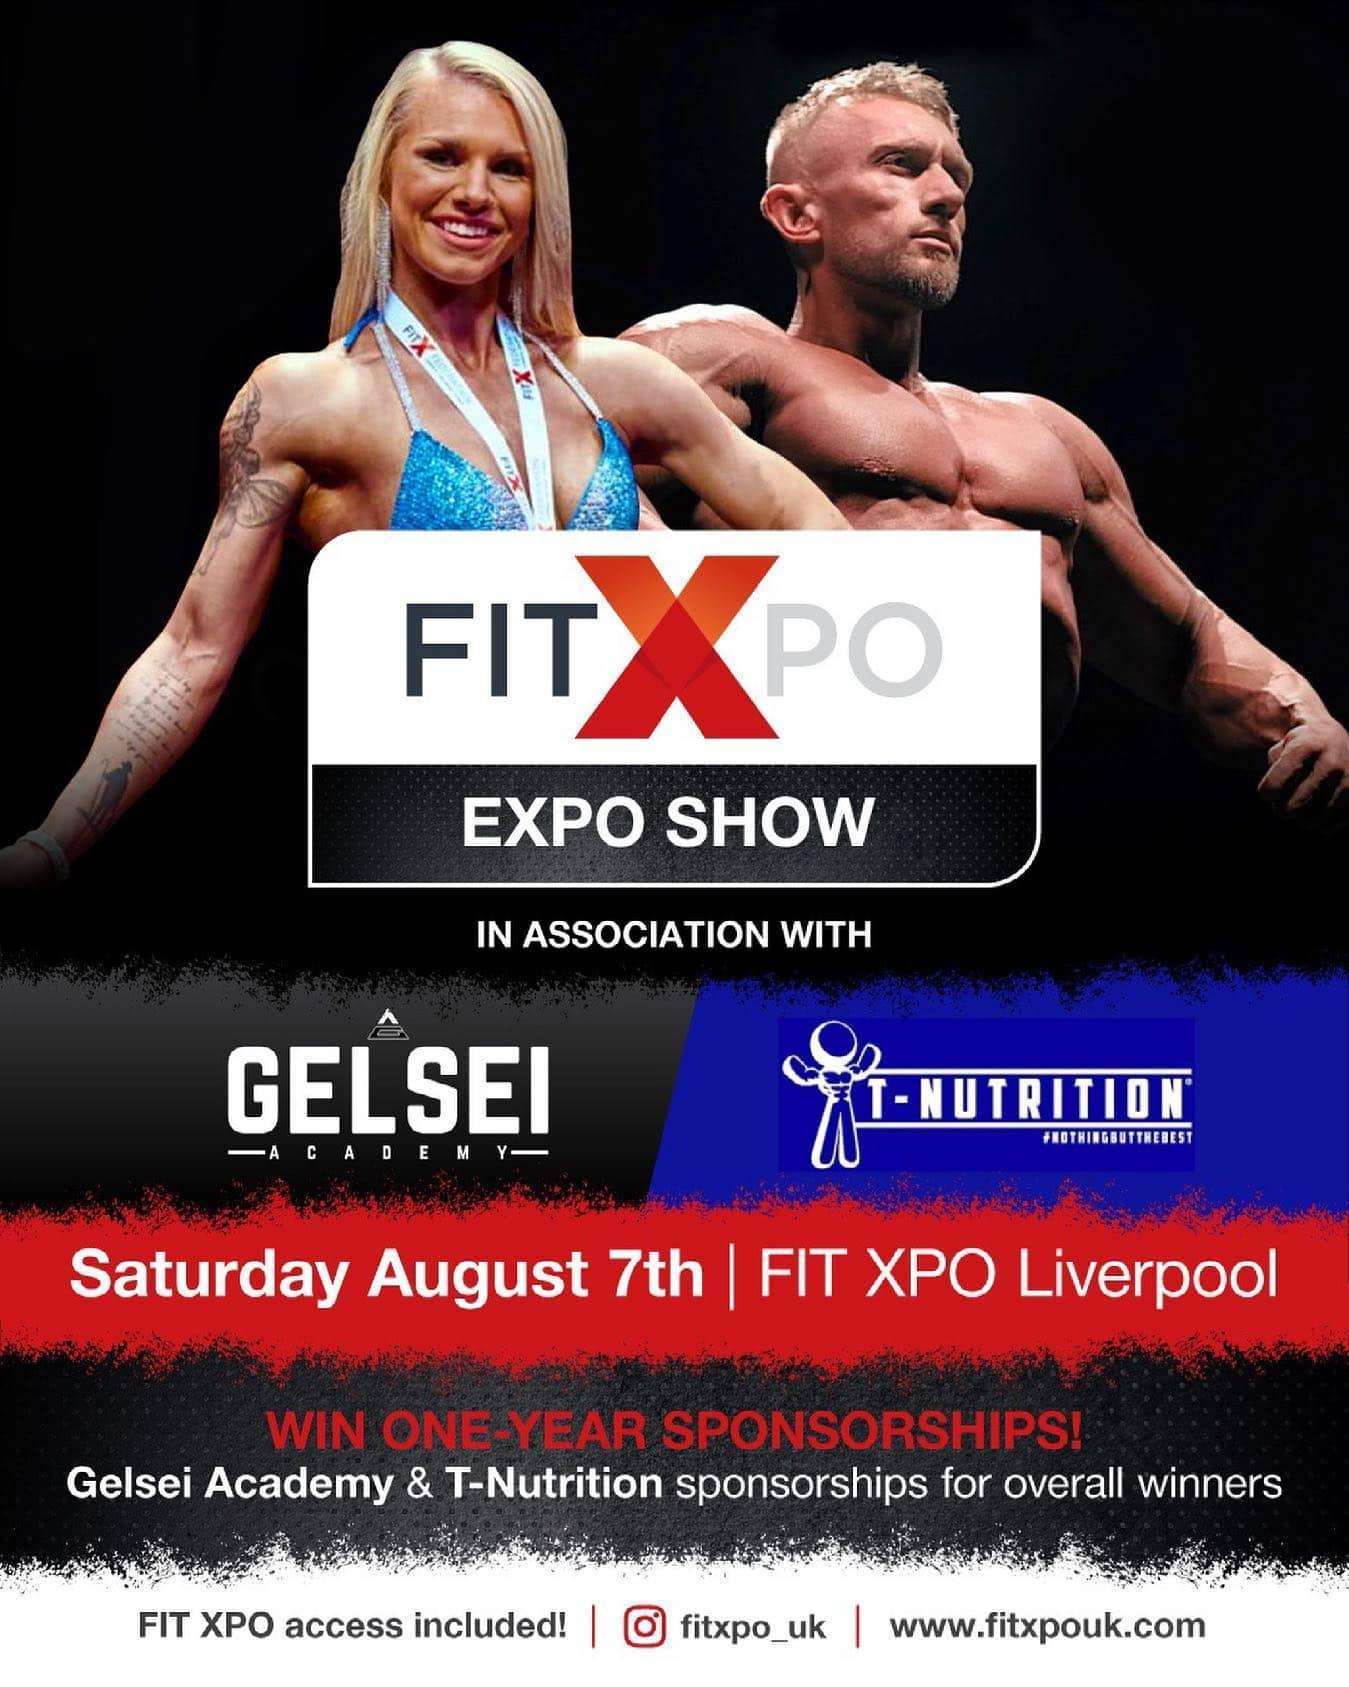 FitXPO EXPO Show